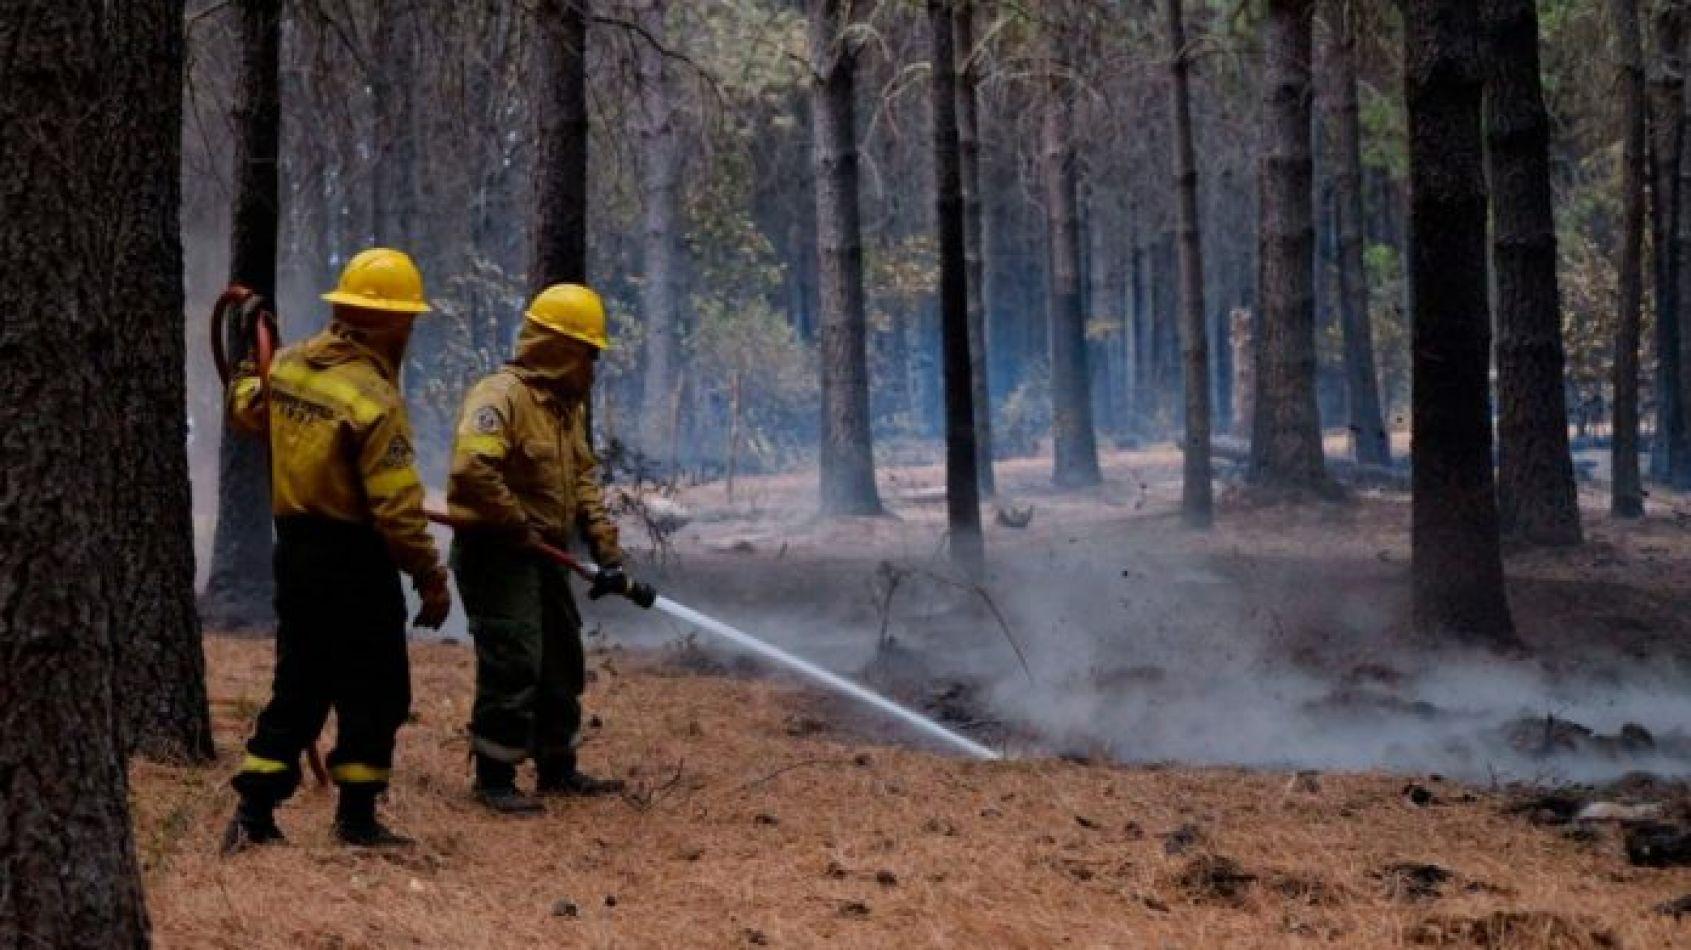 $3 millones de recompensa para encontrar a los responsables de los incendios en Chubut